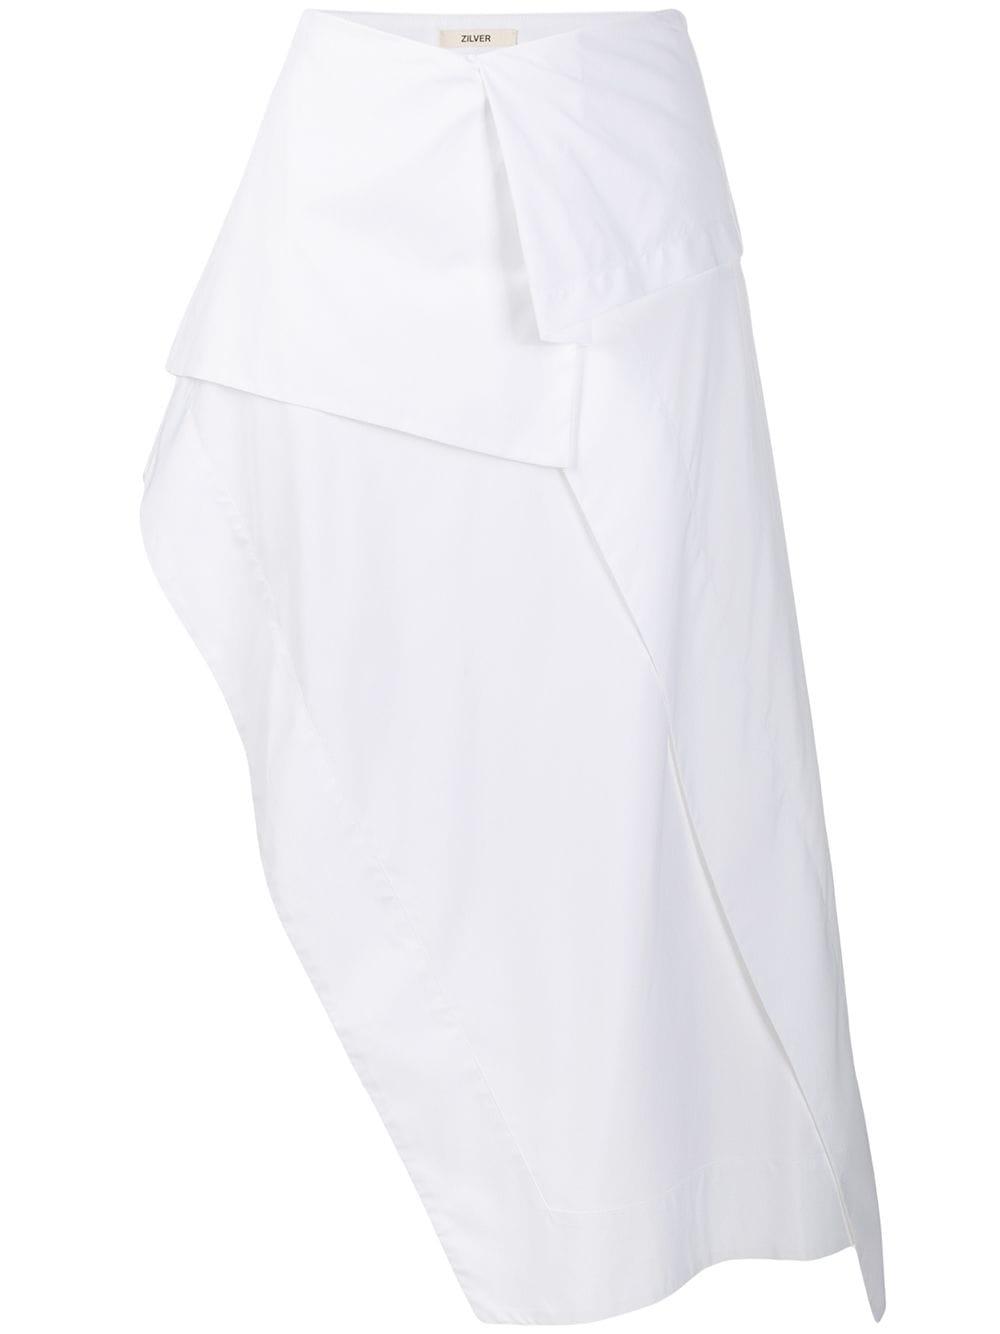 Zilver юбка асимметричного кроя